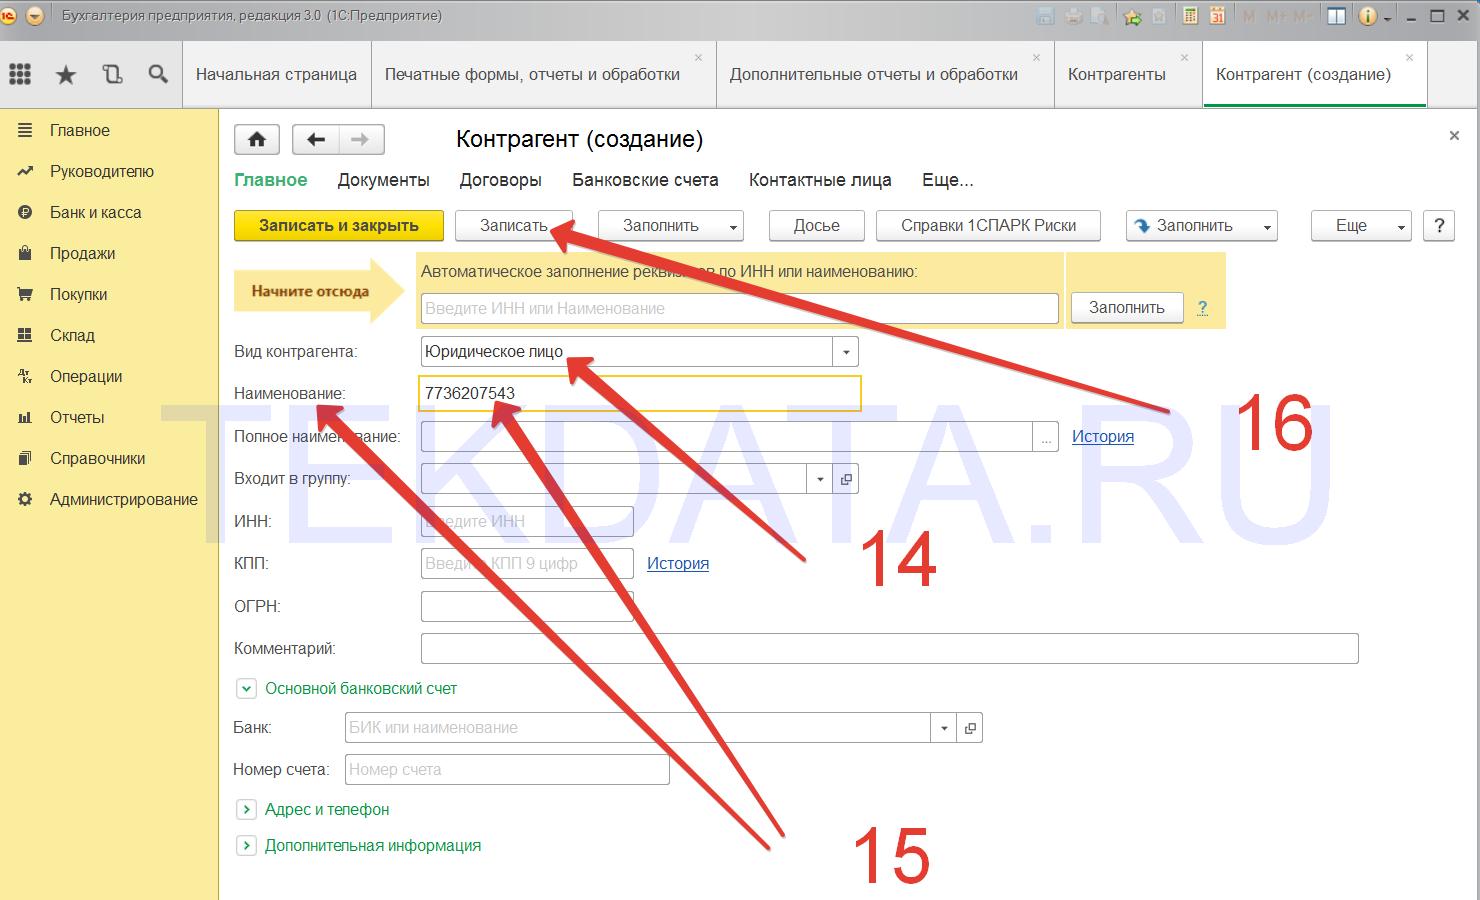 Заполнение контрагентов по ИНН или ОГРН в БП 3.0 (Действия 14-15-16) | tekdata.ru